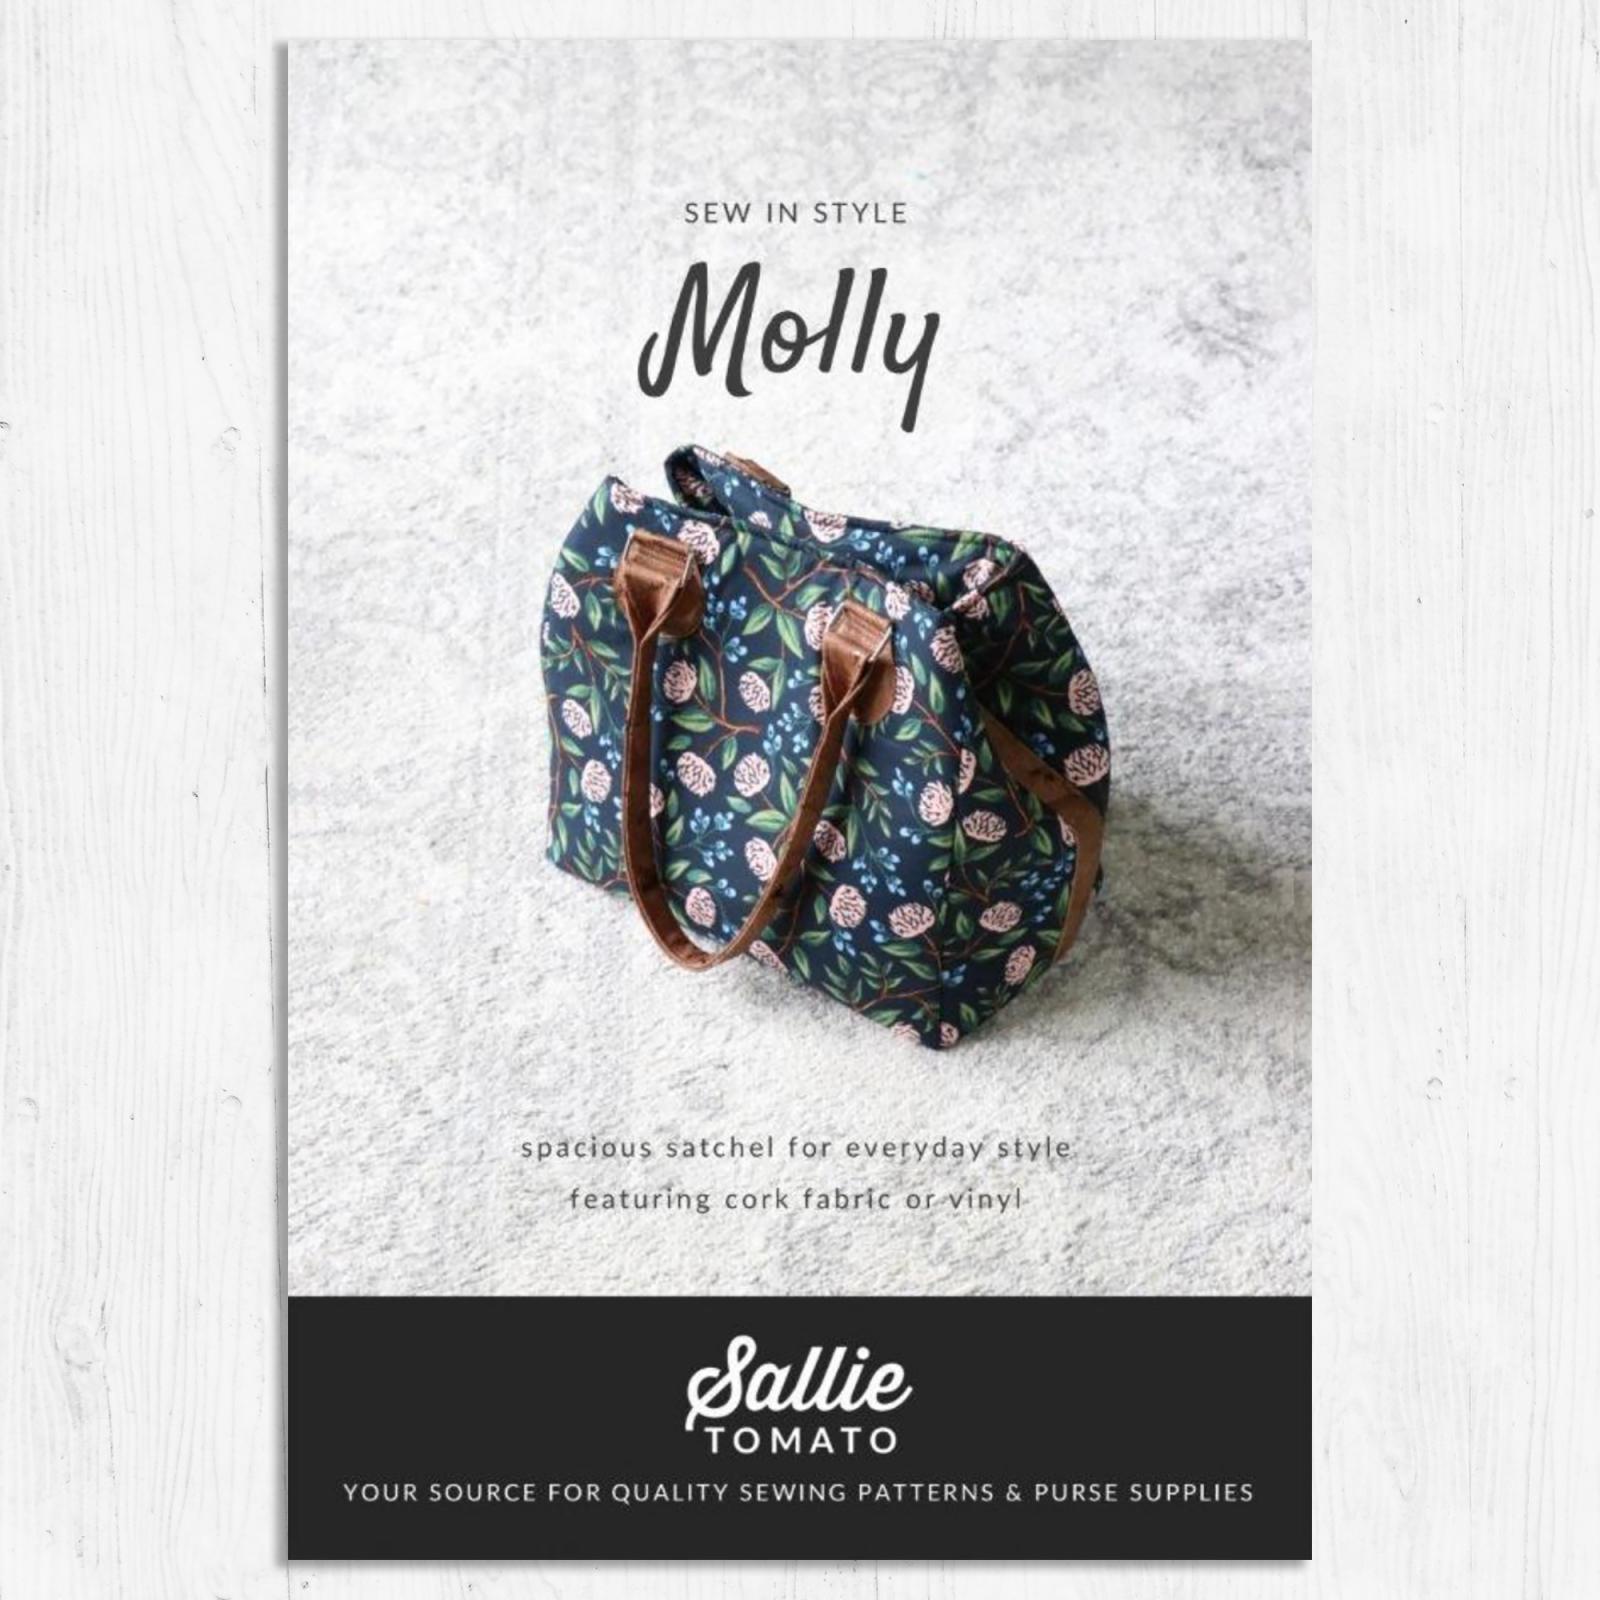 Sallie Tomato- Molly Bag Pattern